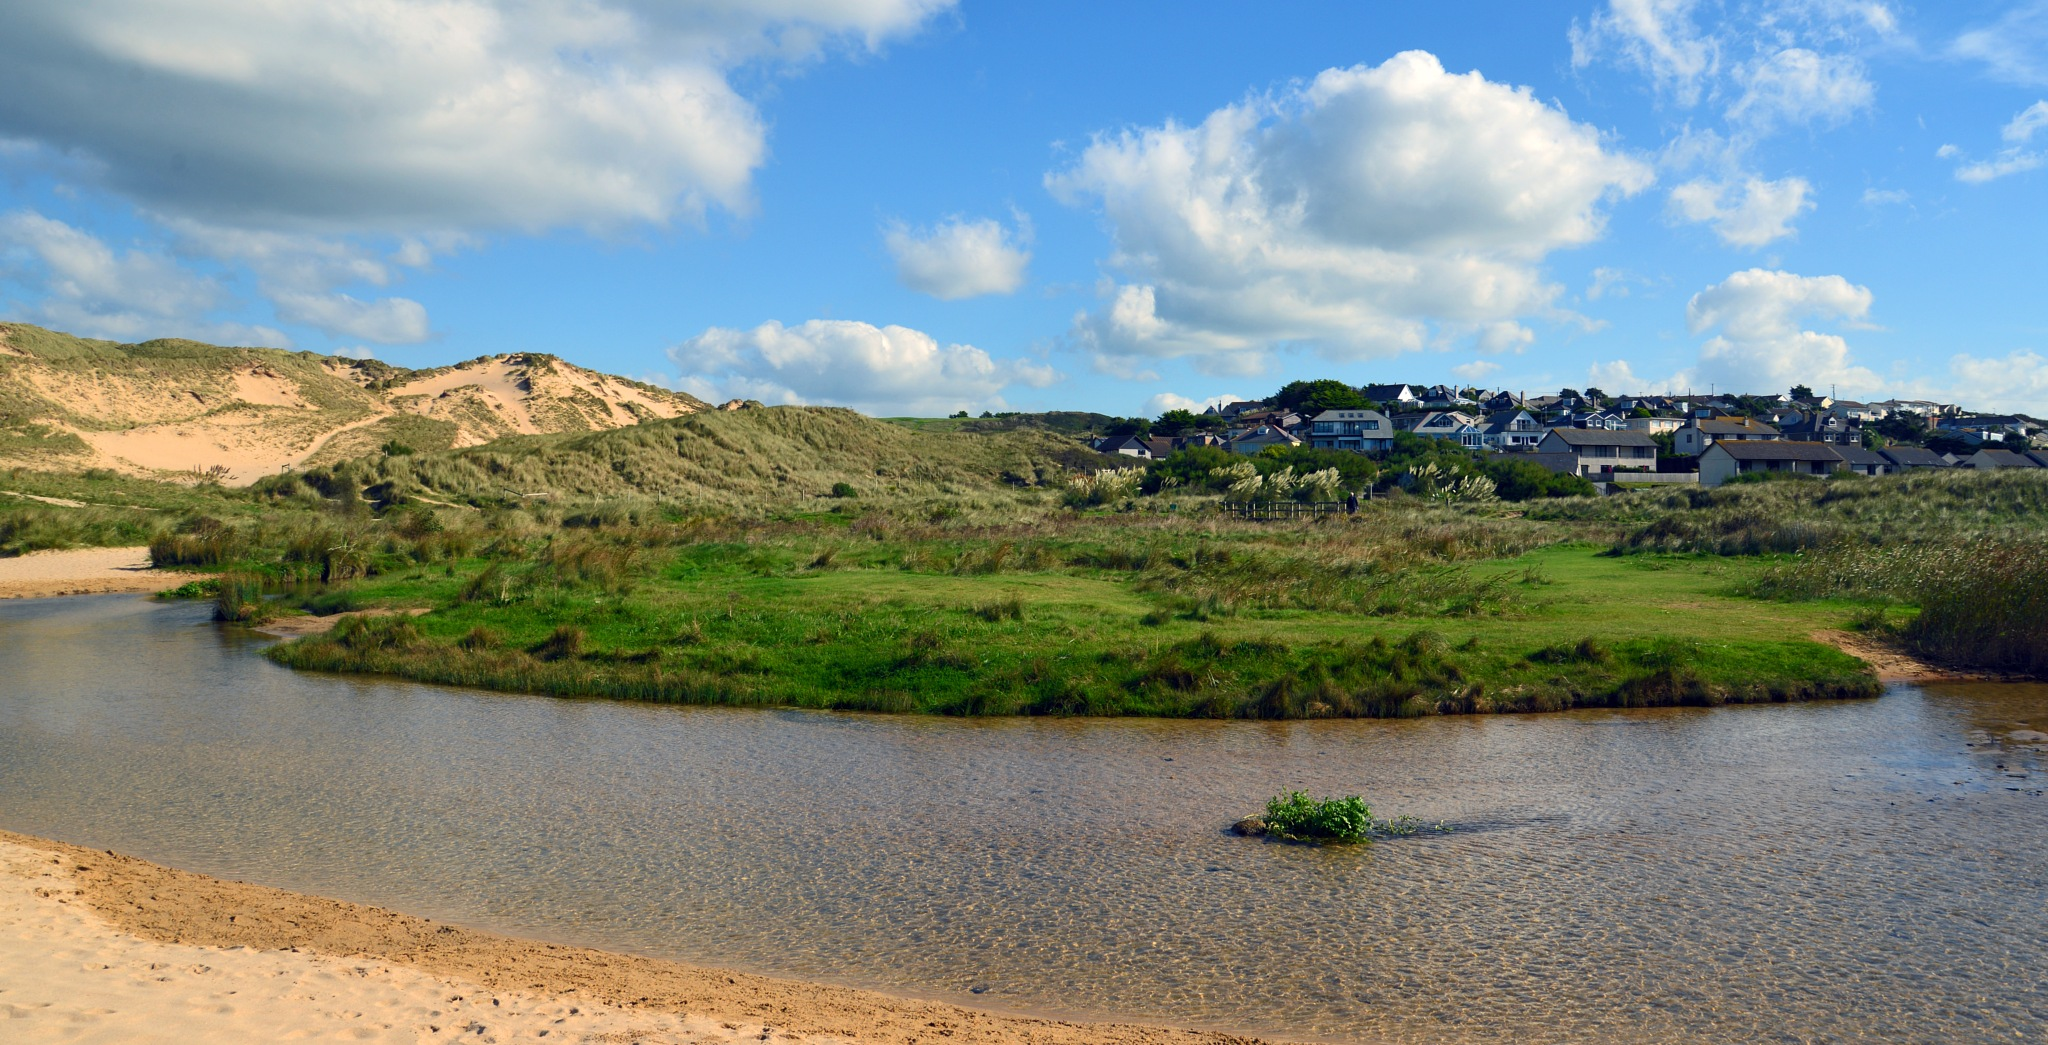 Holywell Bay, 13. by jamez